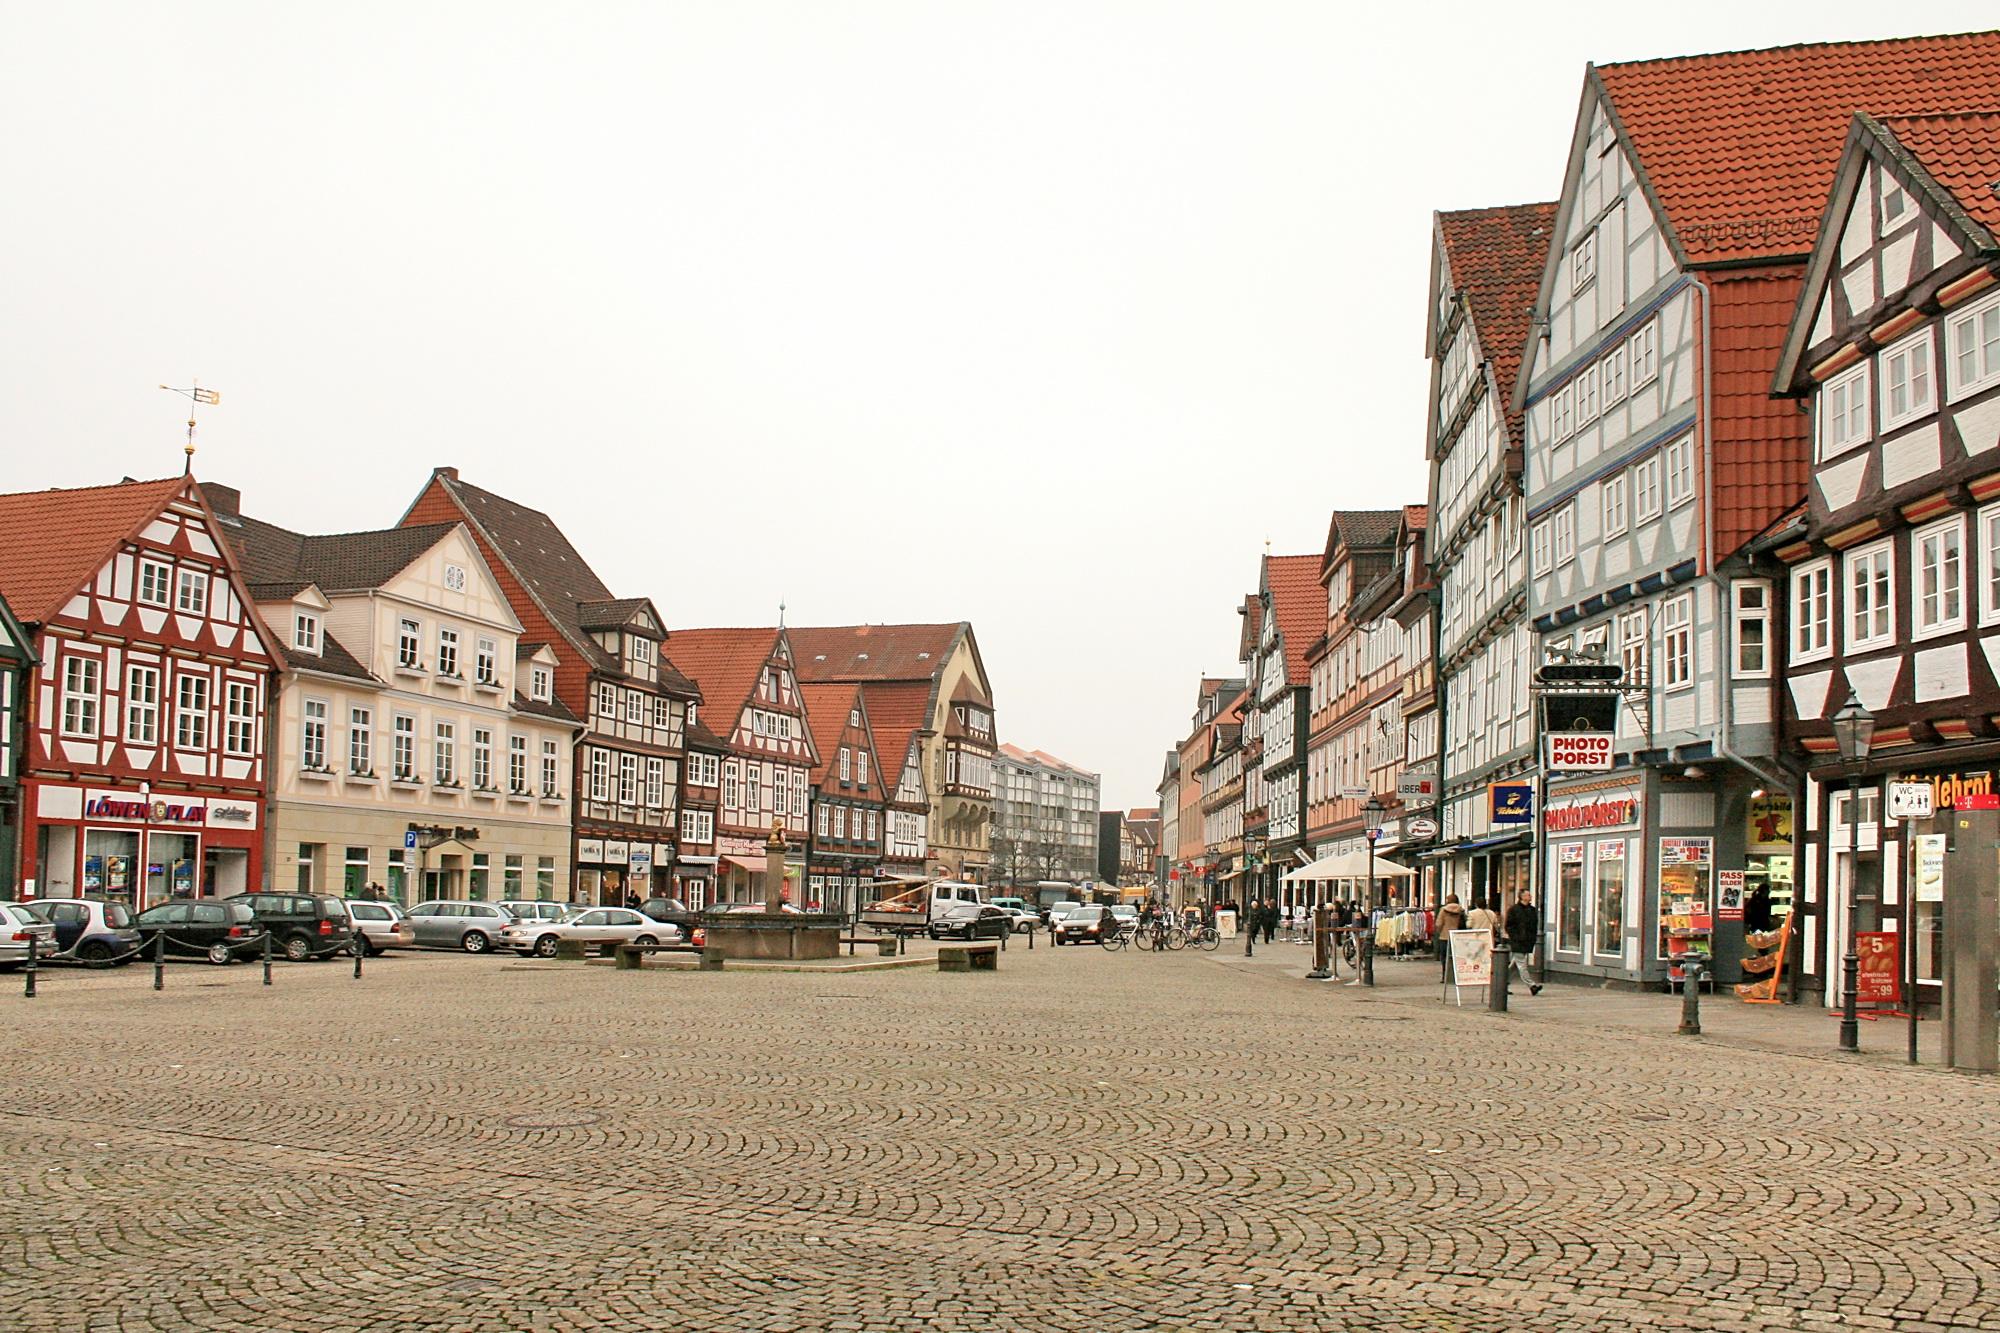 FileCeller Altstadt IMG 1263jpg  Wikimedia Commons